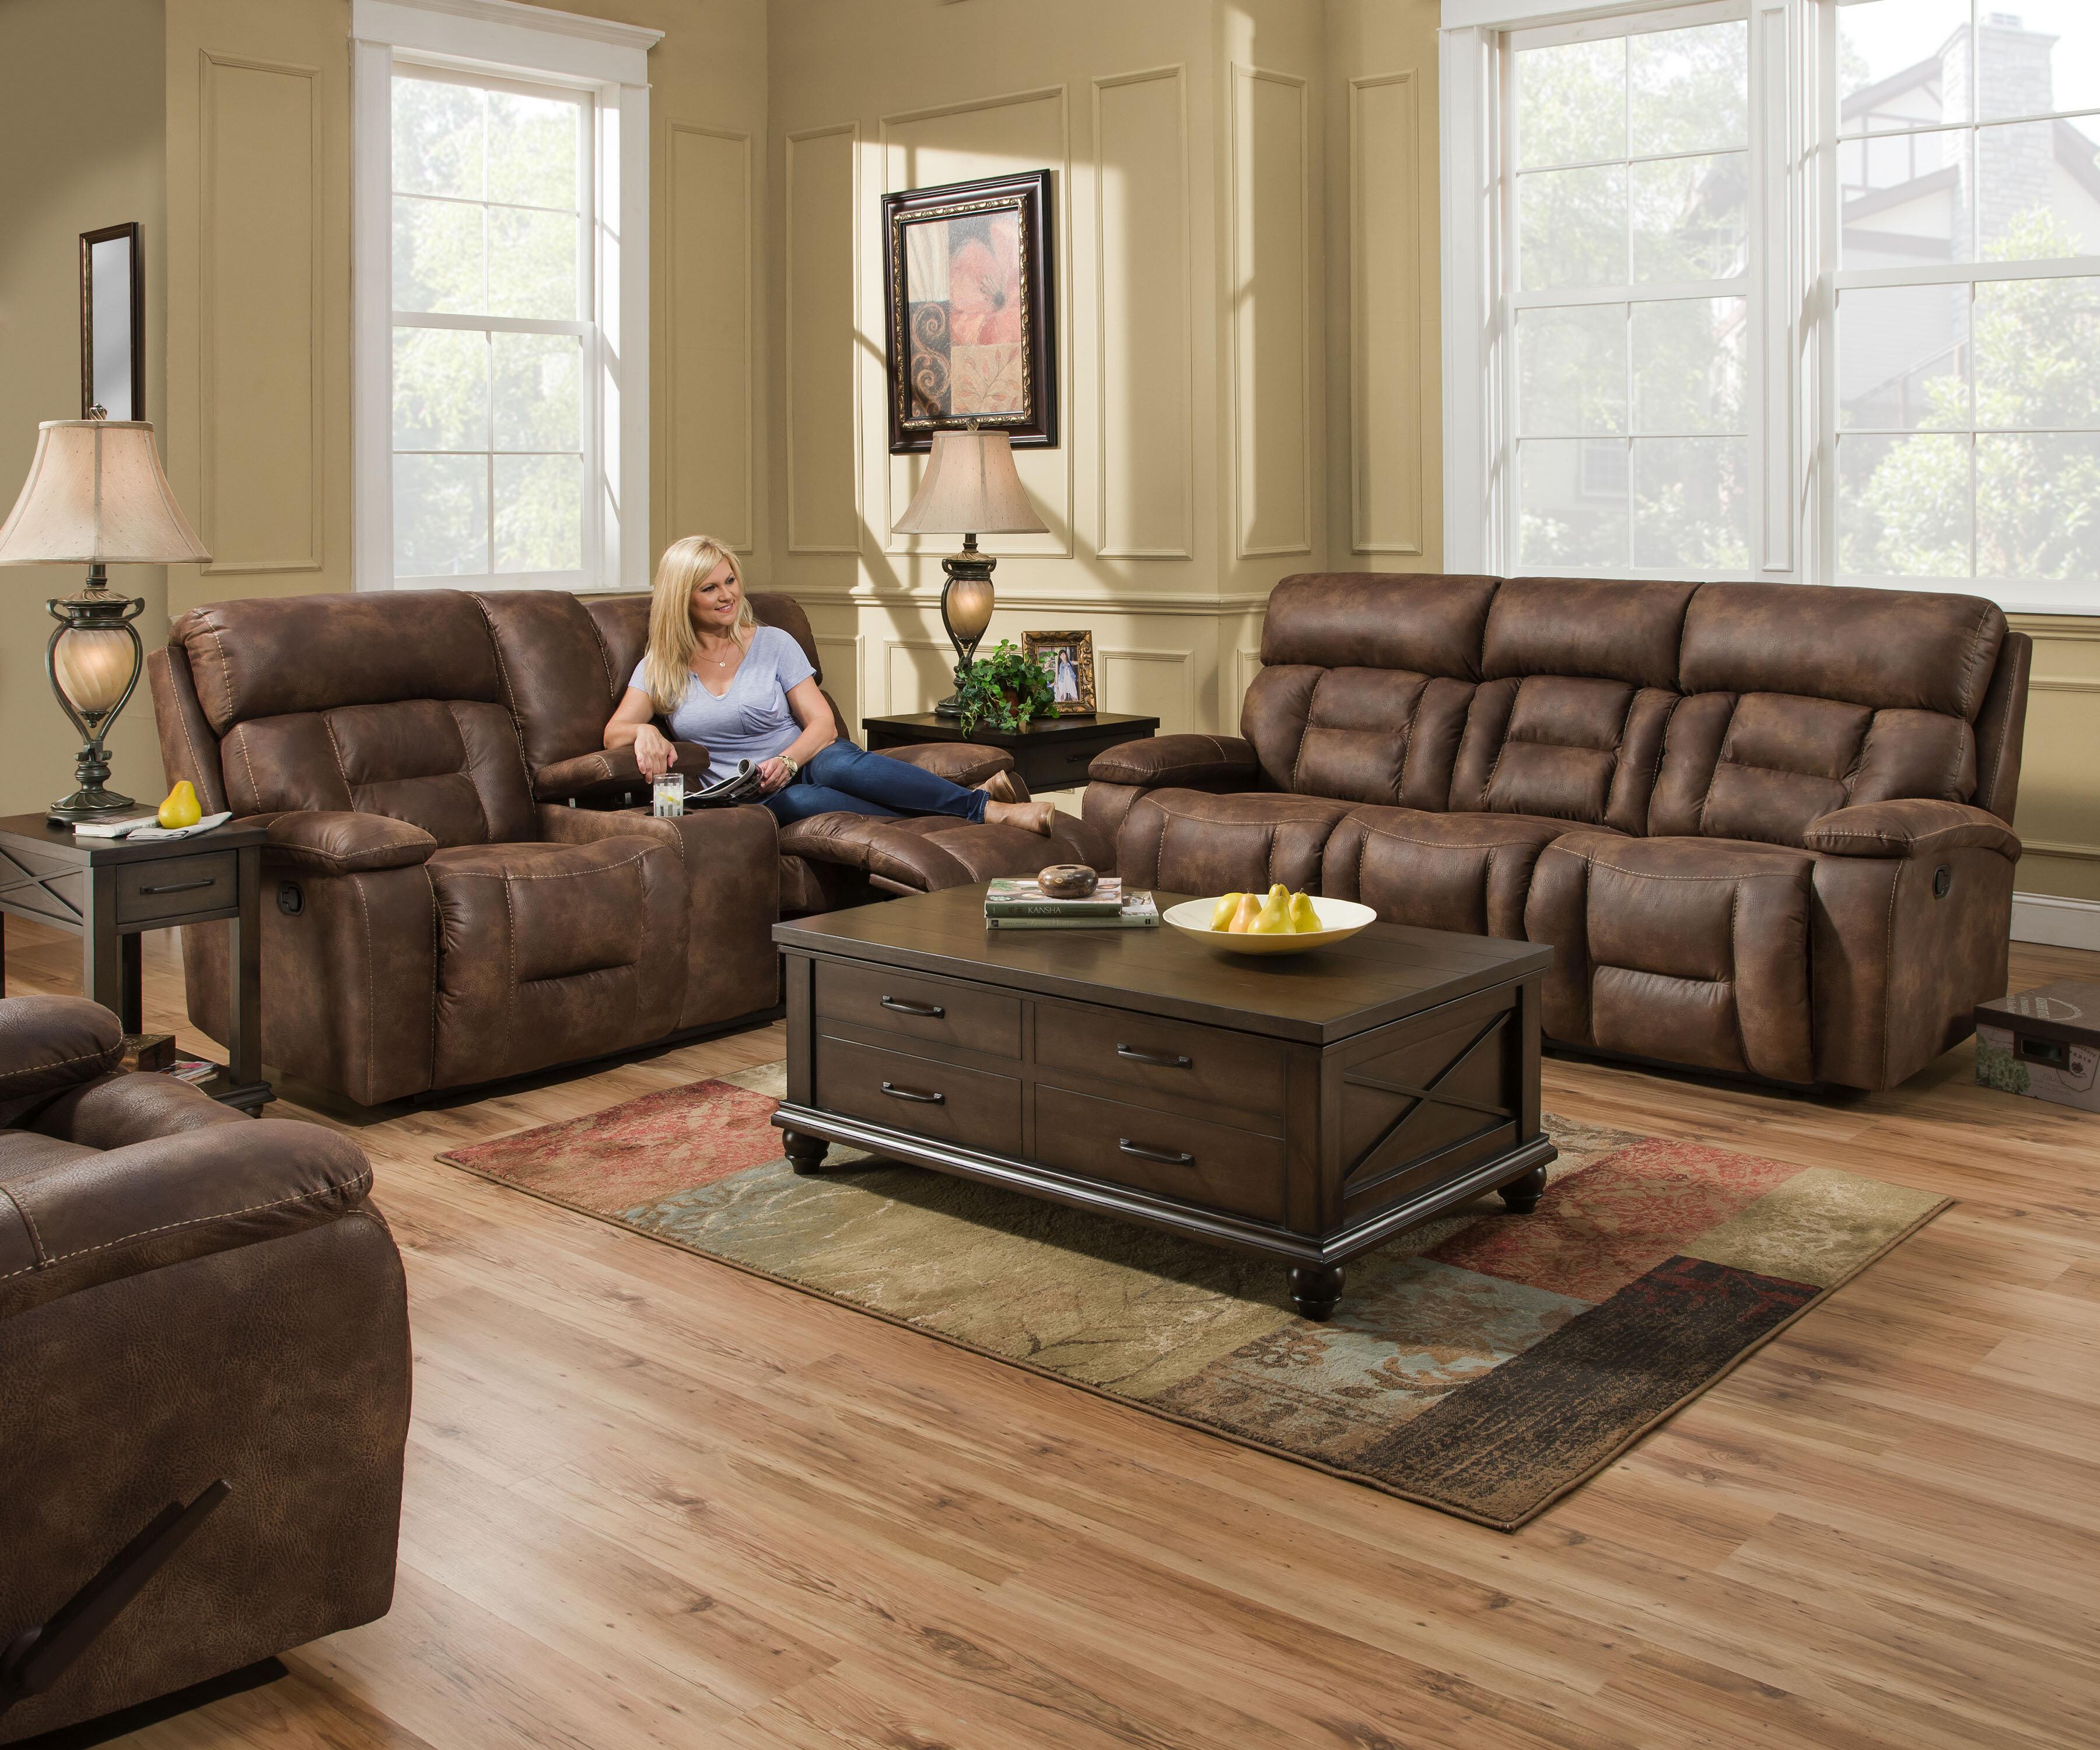 Rustic Living Room Sets You\'ll Love in 2019   Wayfair